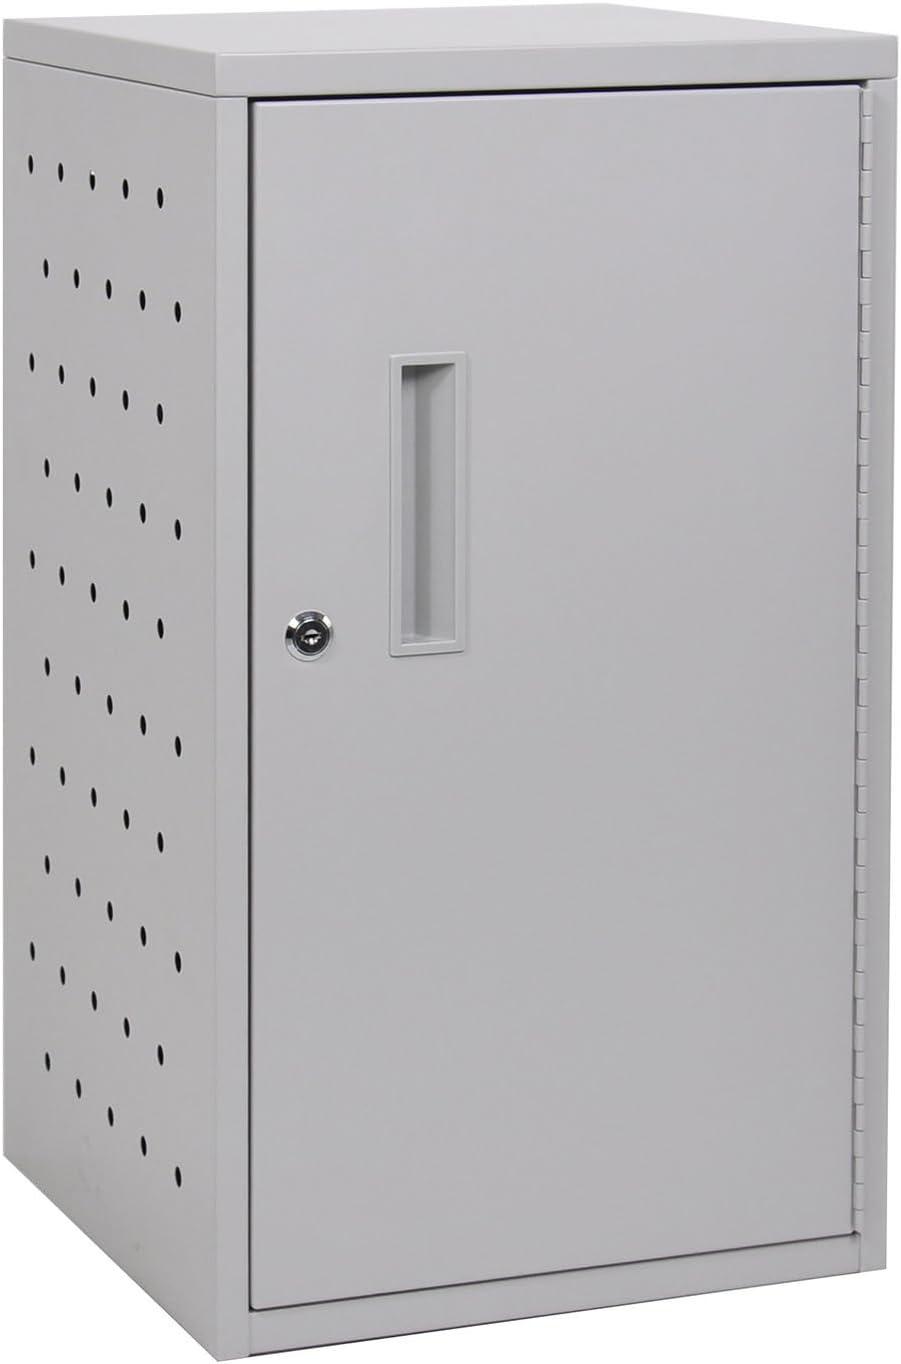 Offex Steel Vertical Wall Mesa Mall Desk Box Charging Door with service Lockable